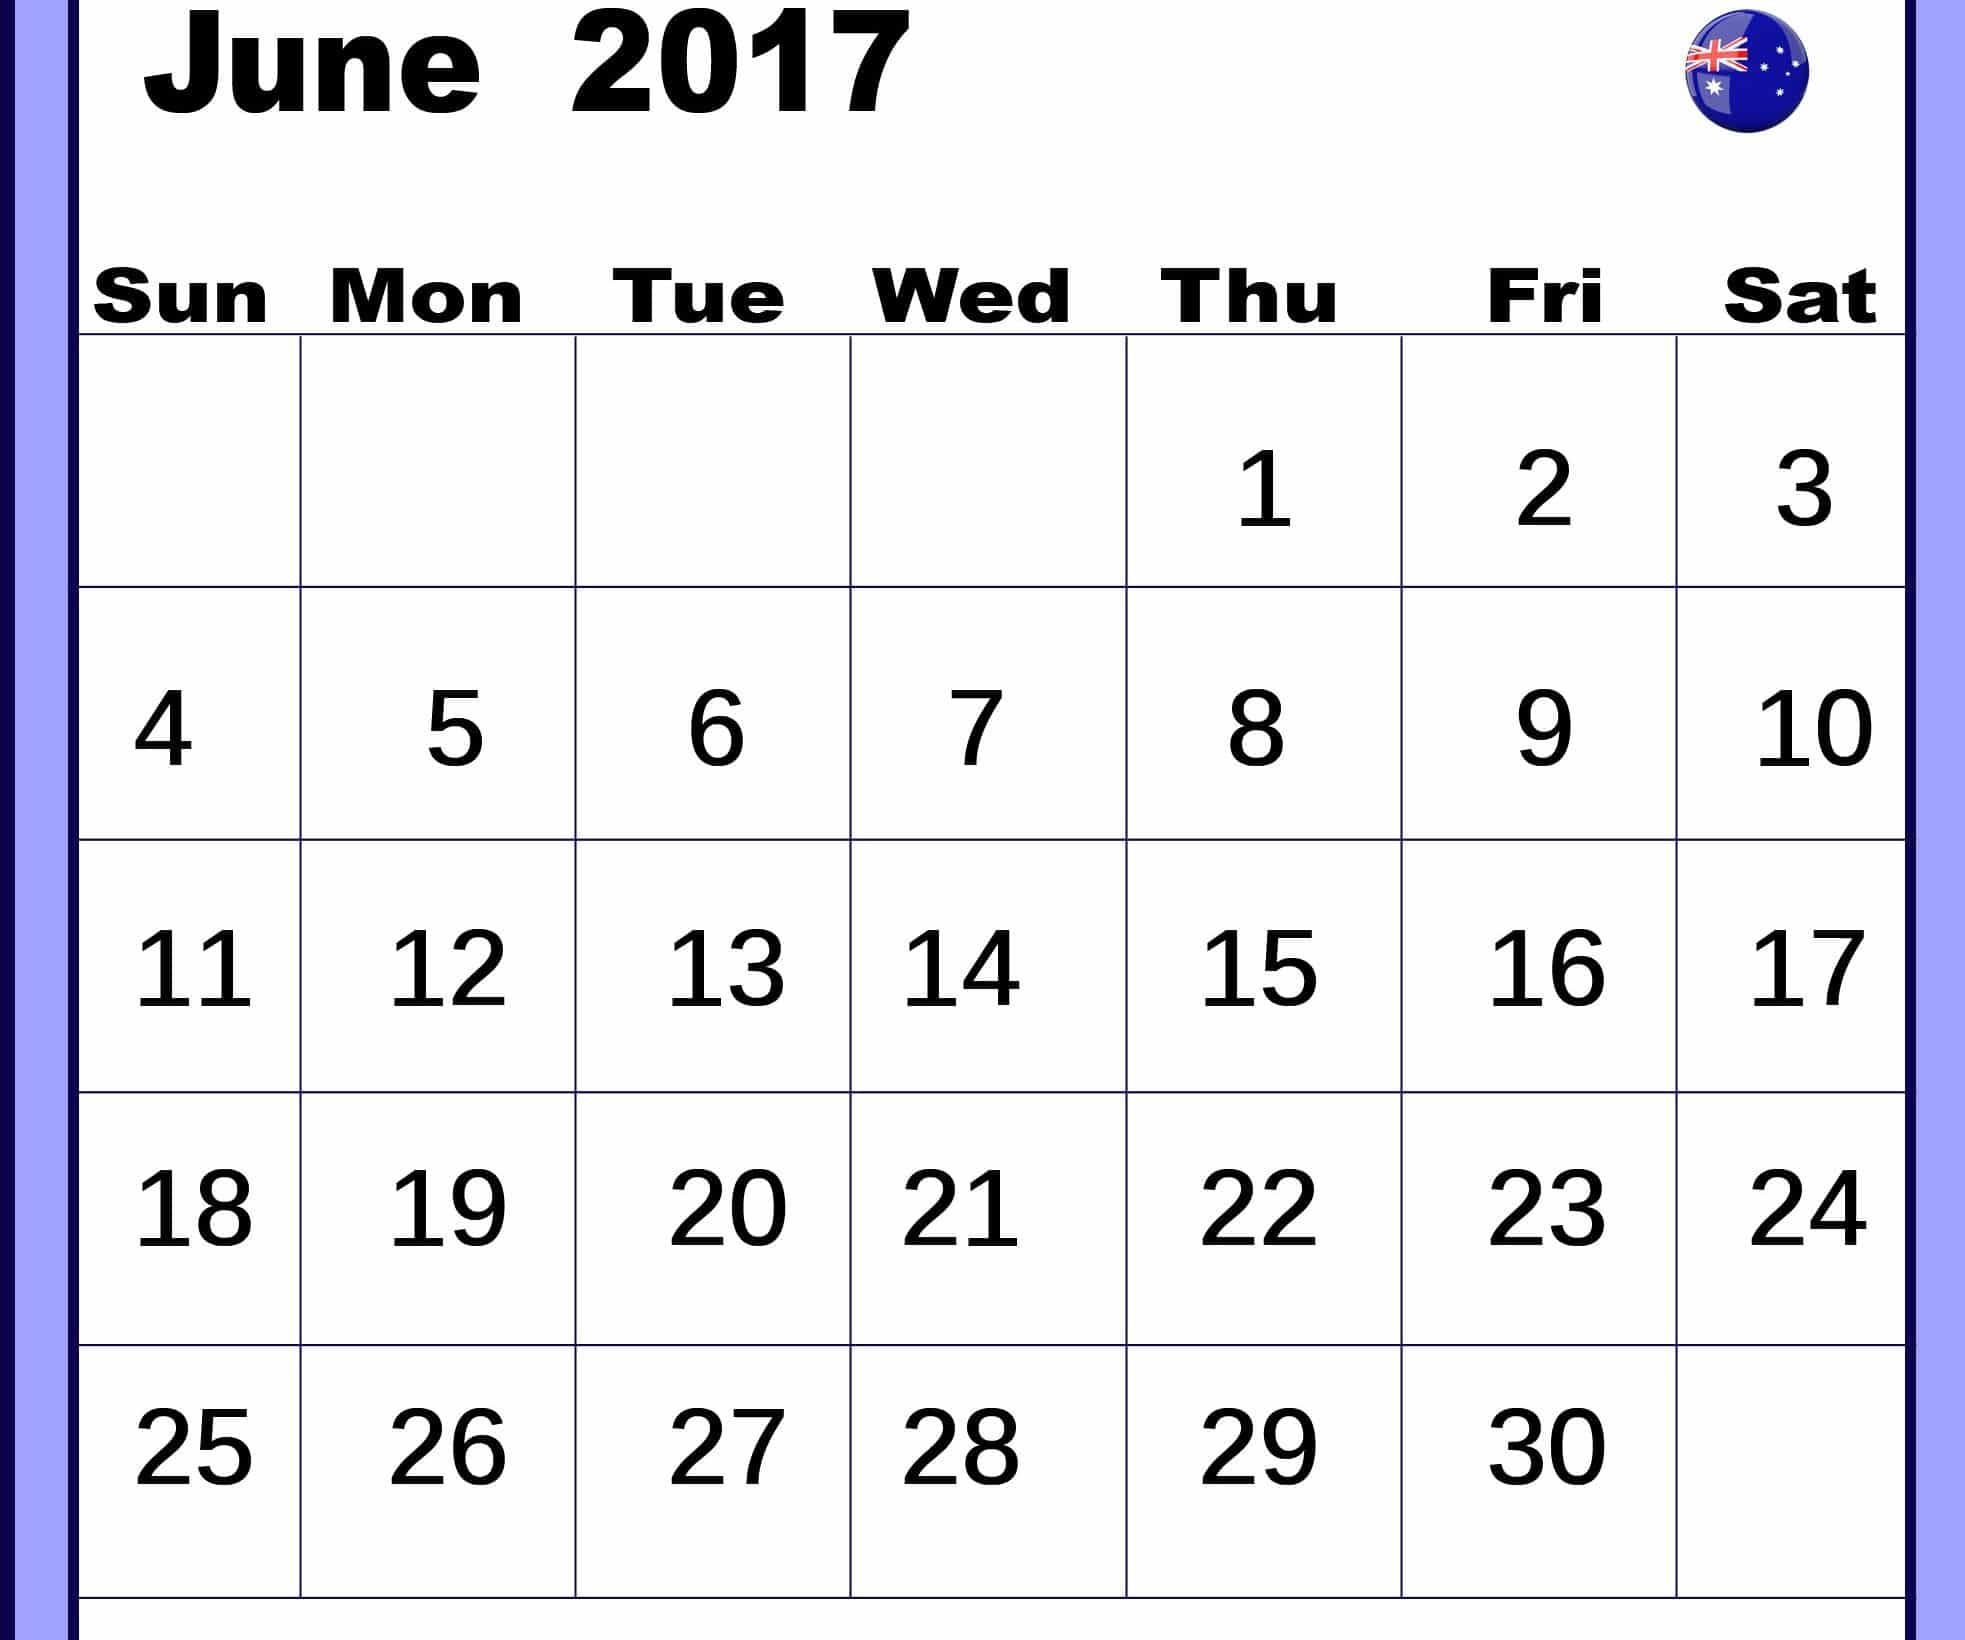 June 2017 calendar Image Australia